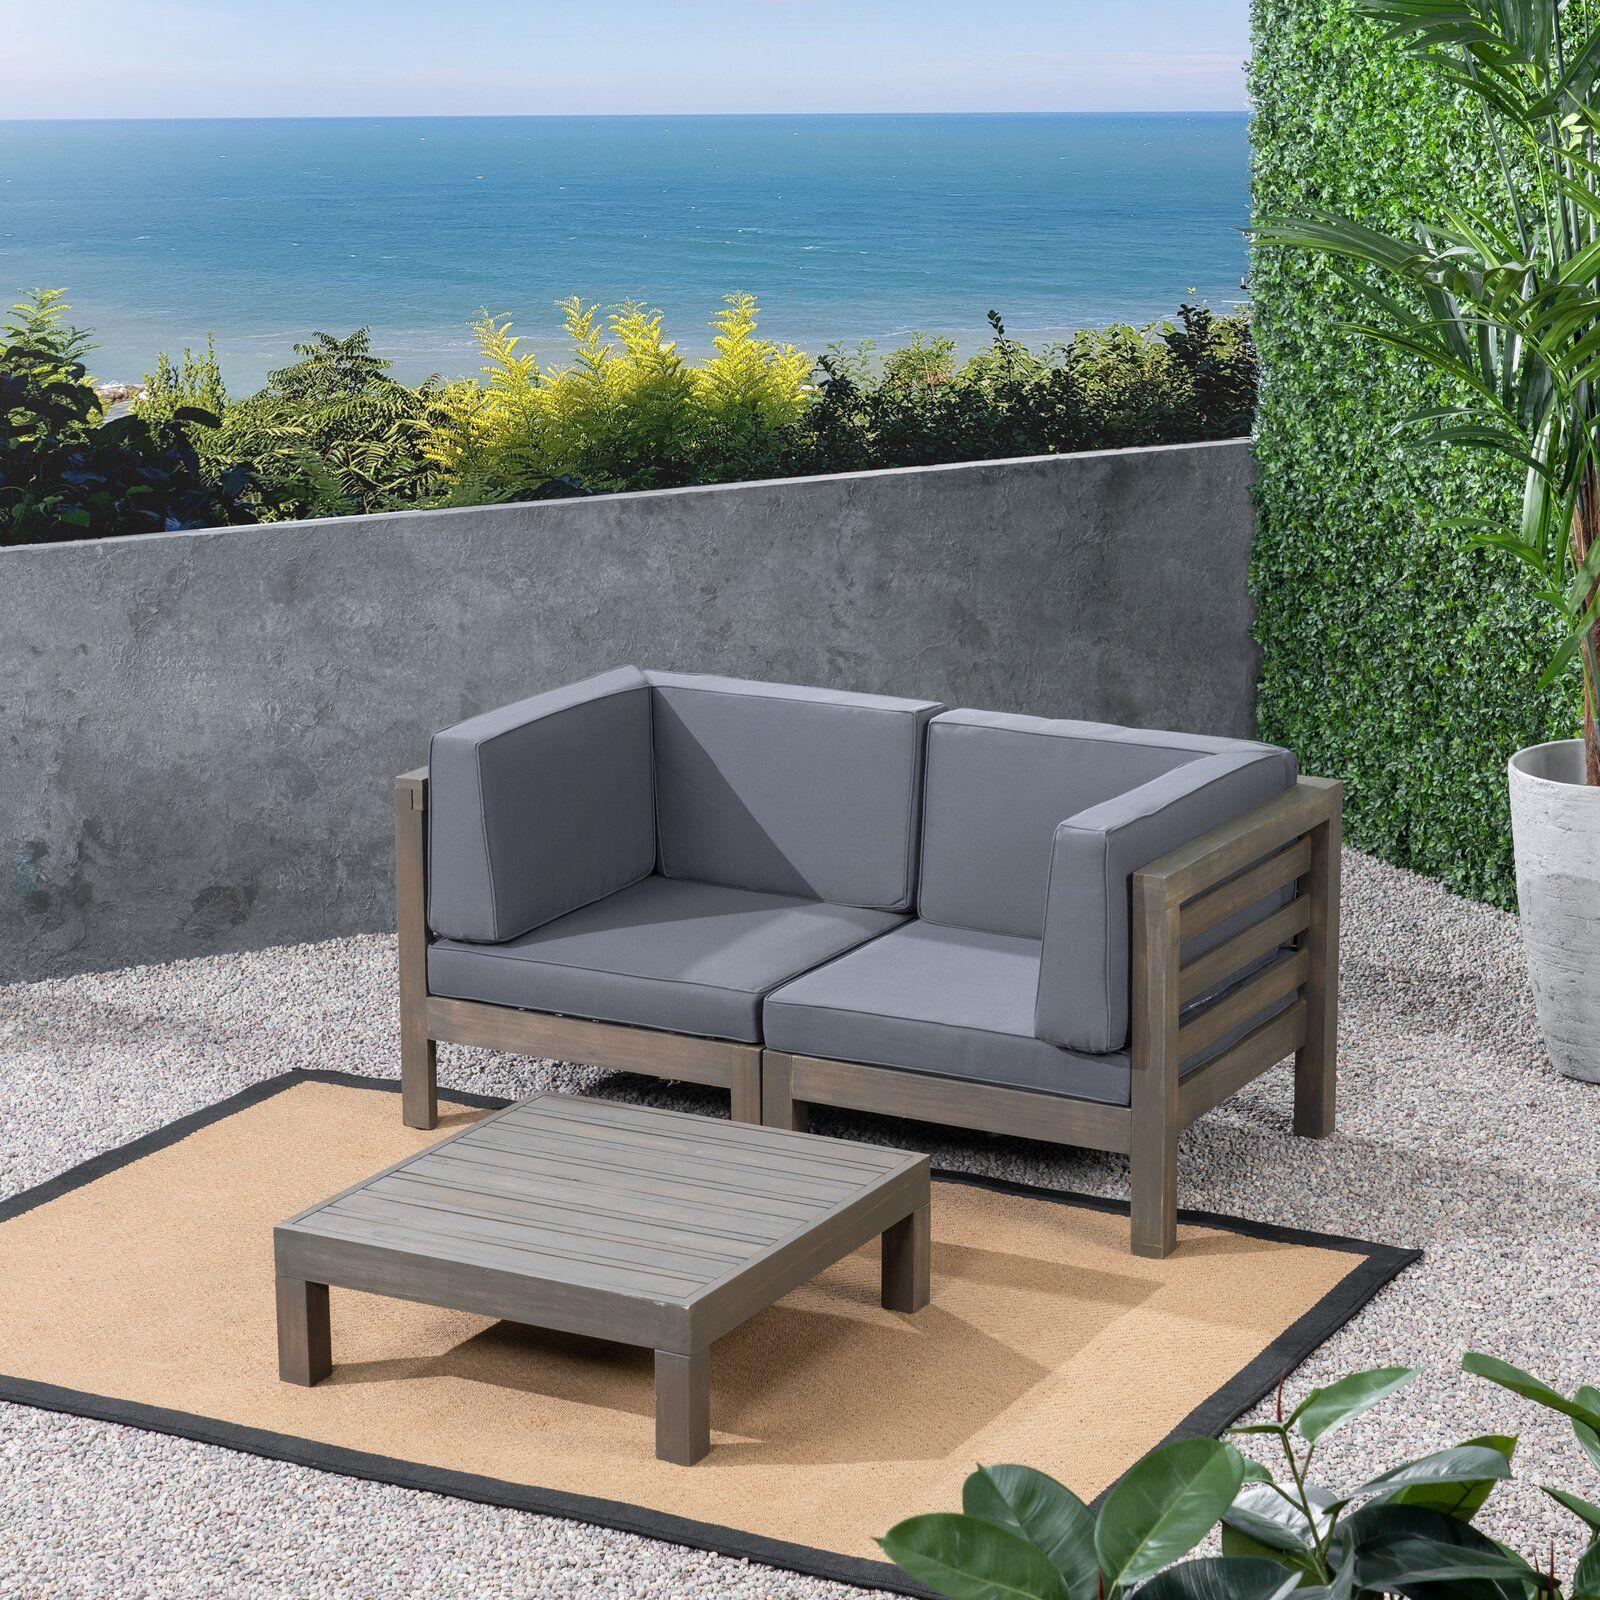 Brayden Studio Seaham 3 Piece Teak Sofa Seating Group With Cushions Wayfair Teak Sofa Conversation Set Patio Seating Groups